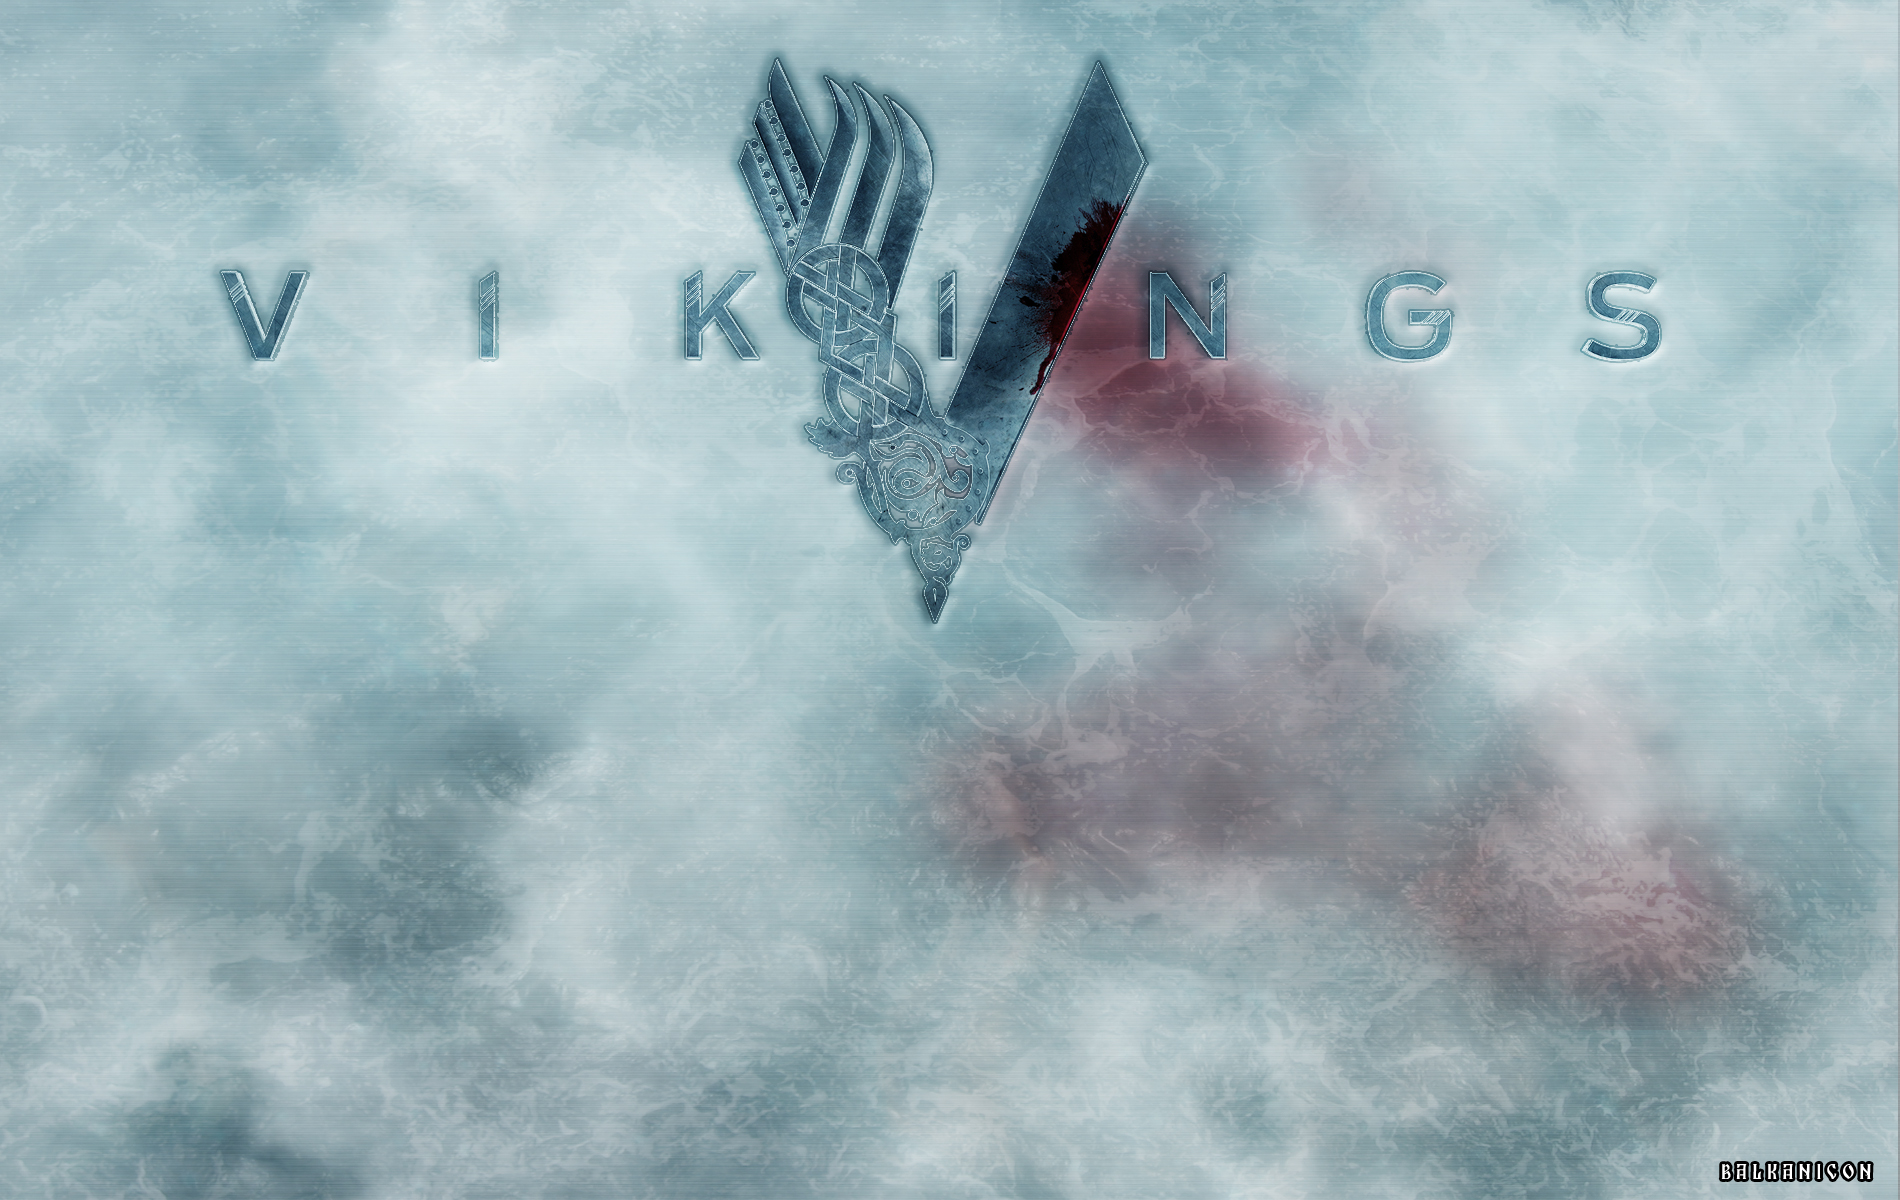 Free Download Vikings Tv Series Wallpaper By Balkanicon